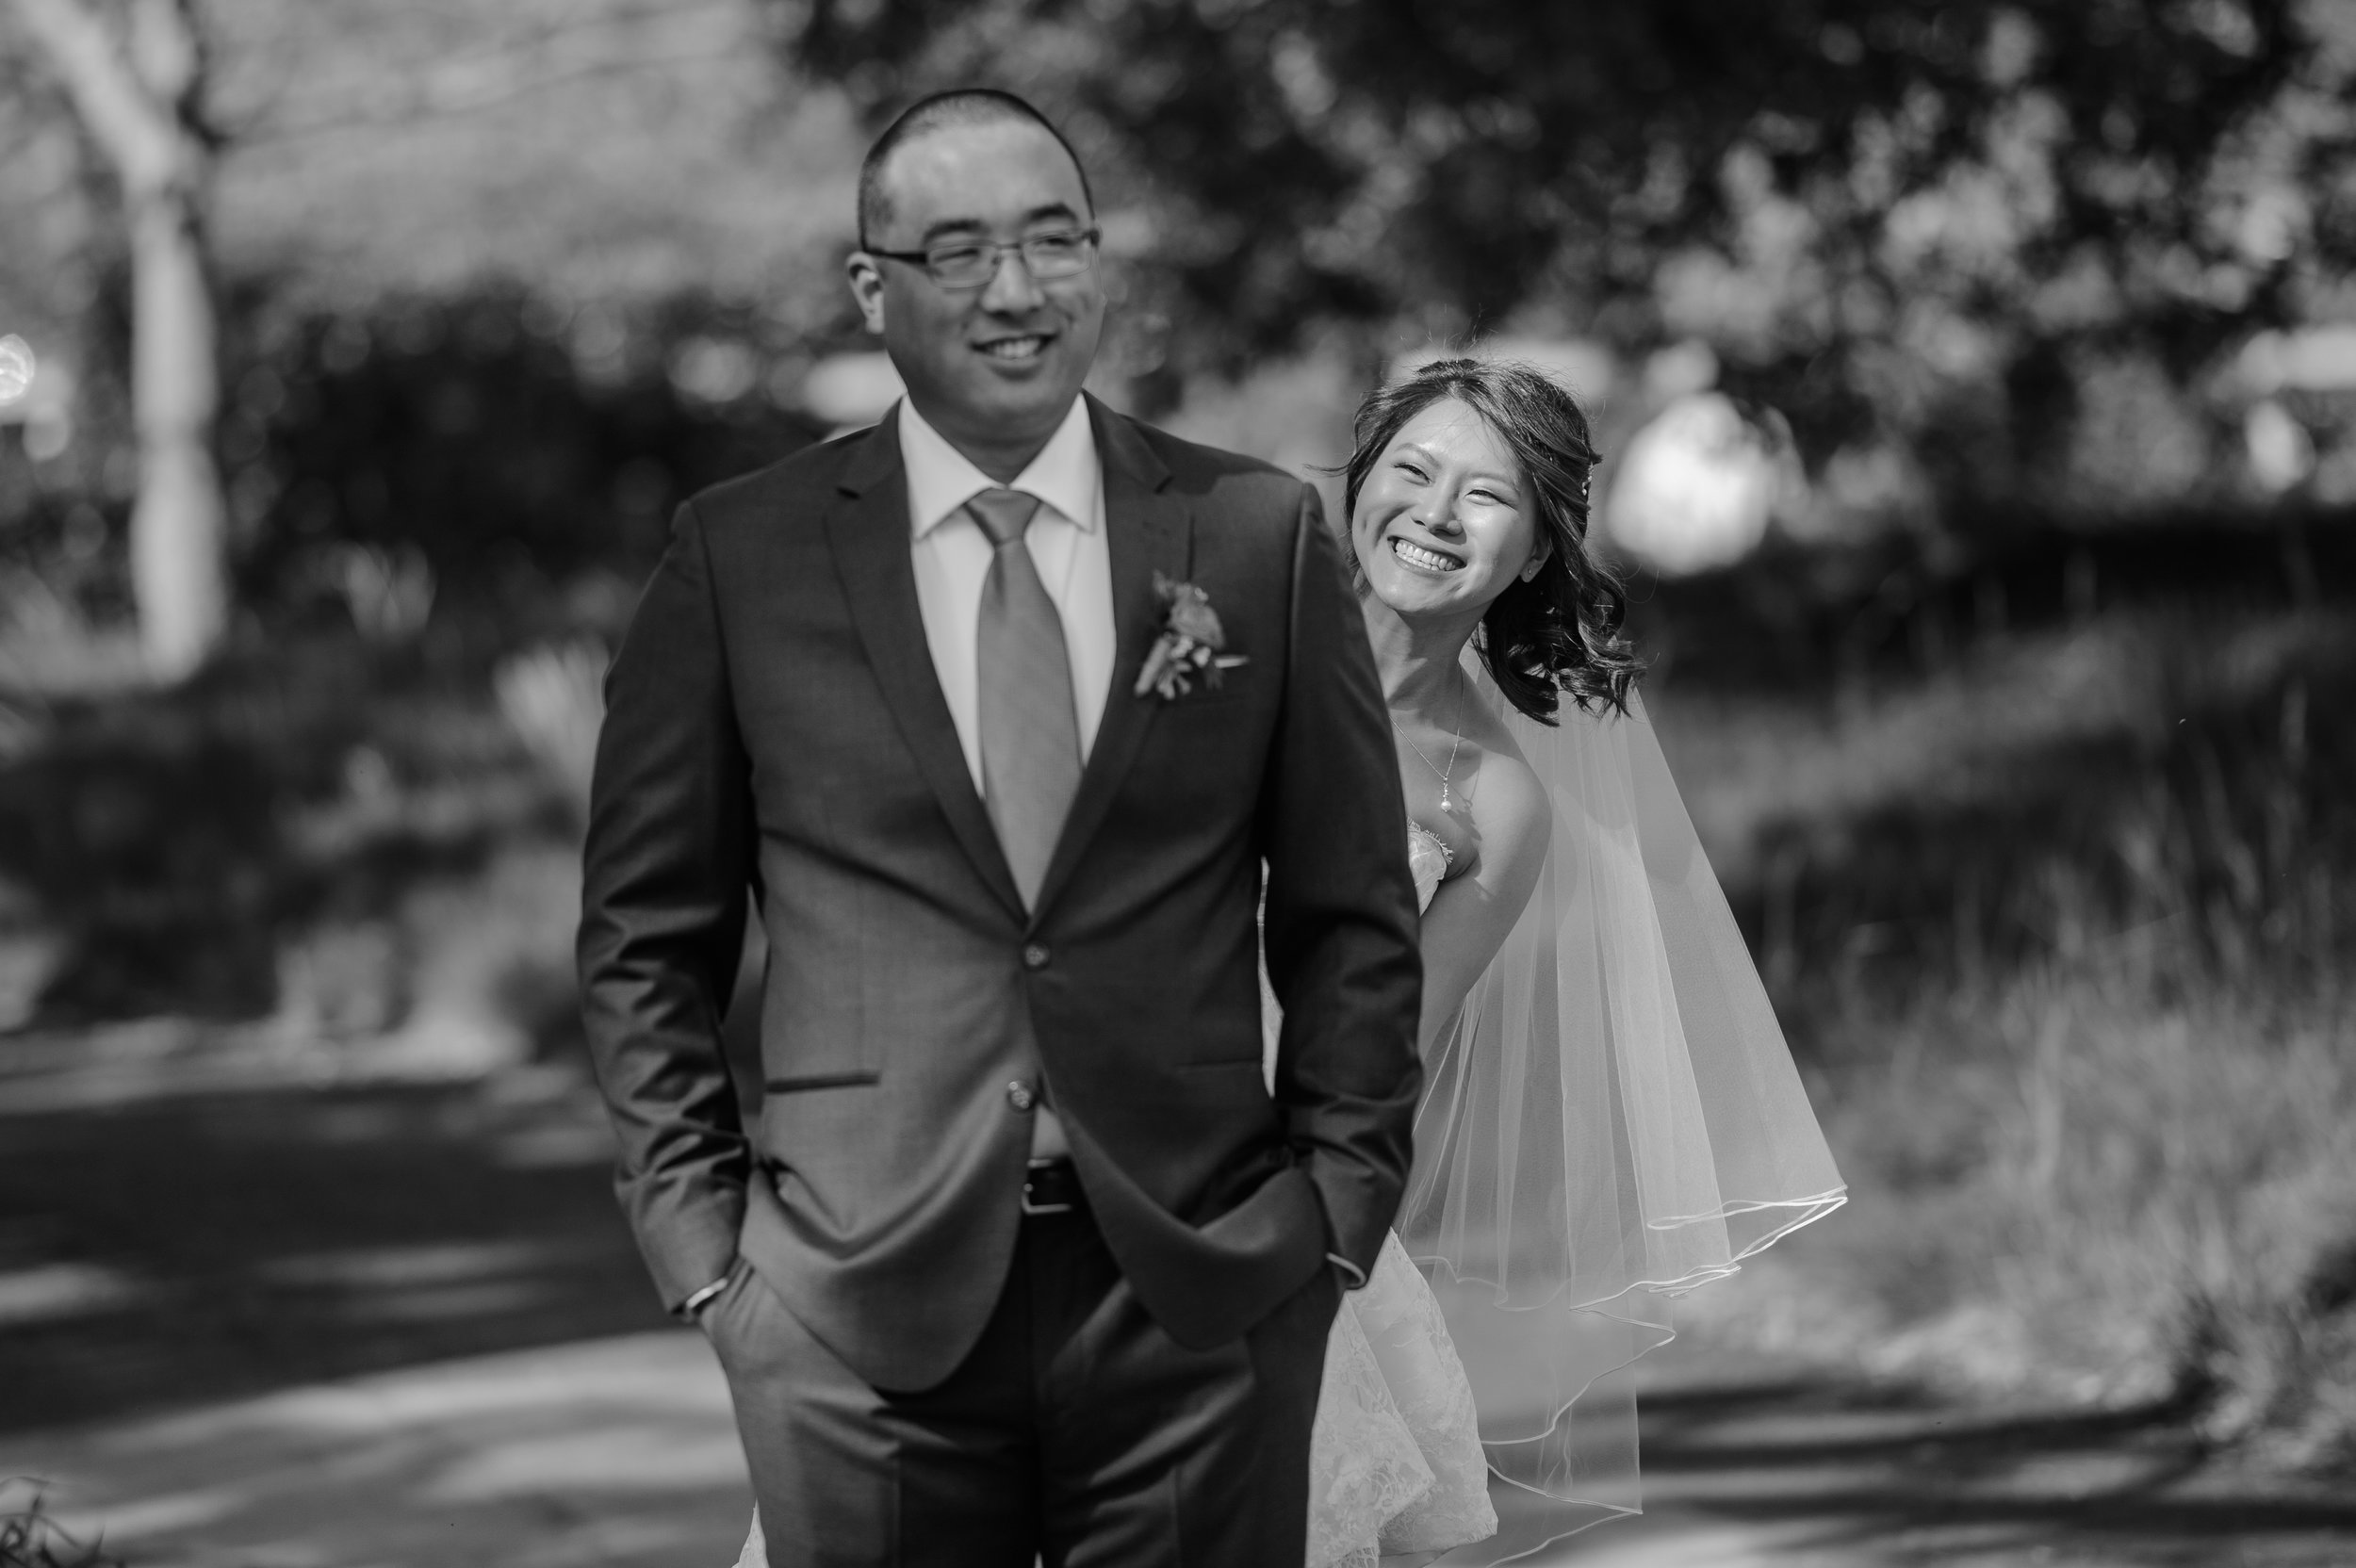 qui-david-018-wente-vineyards-livermore-wedding-photographer-katherine-nicole-photography.JPG